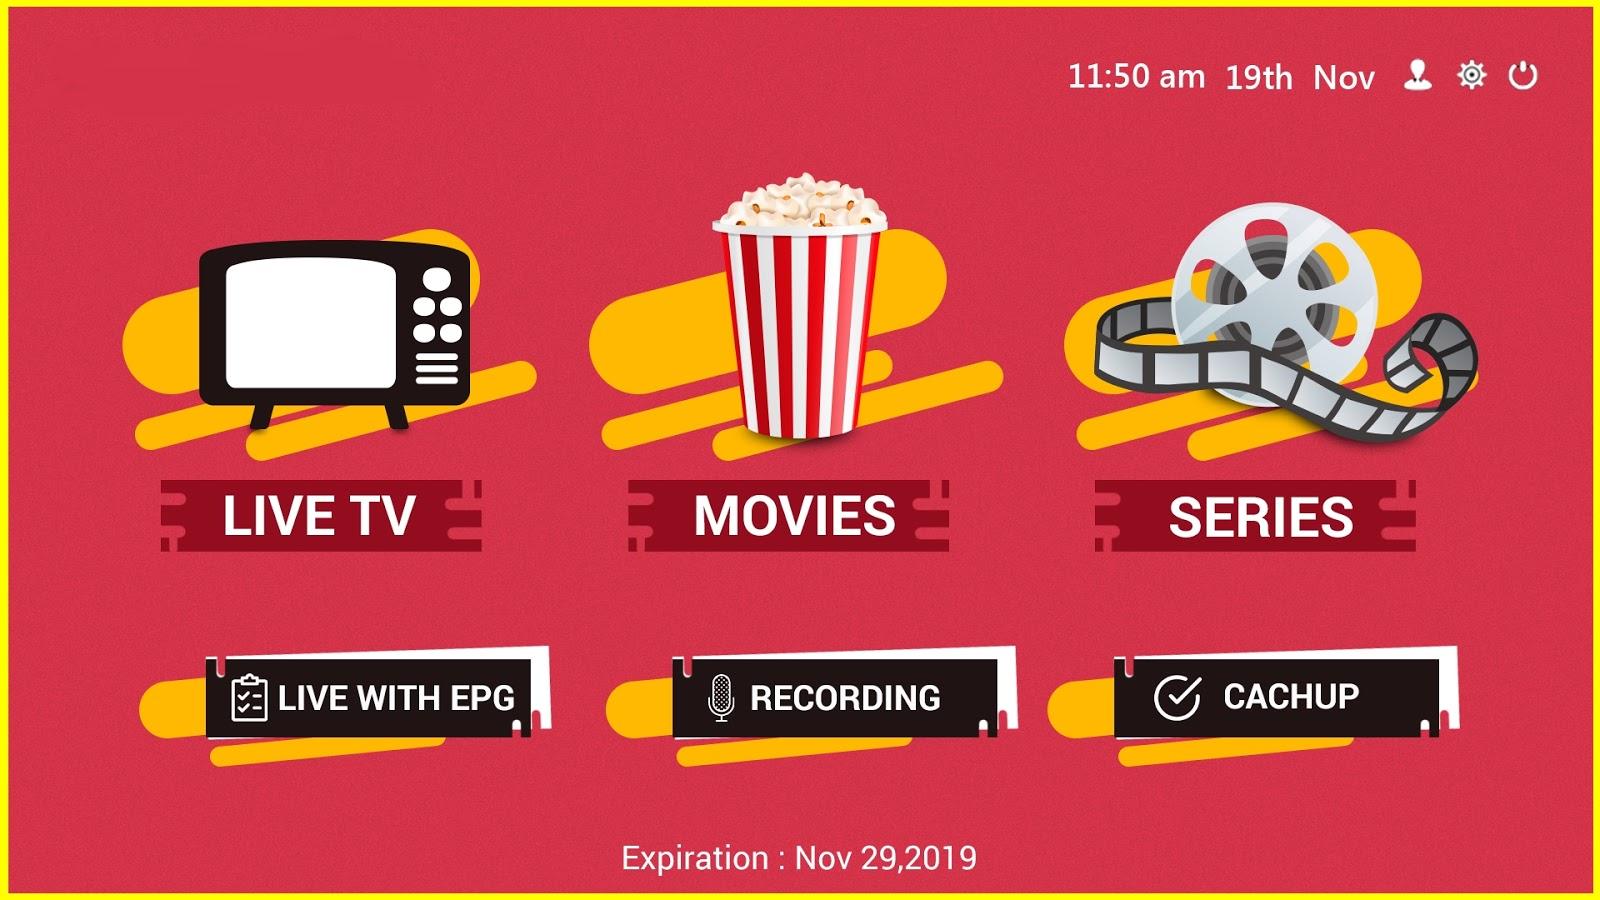 IMPRESSIVE NEW FREE IPTV FULL HD LIVE CHANNELS APK, 2019 WITH 8000+